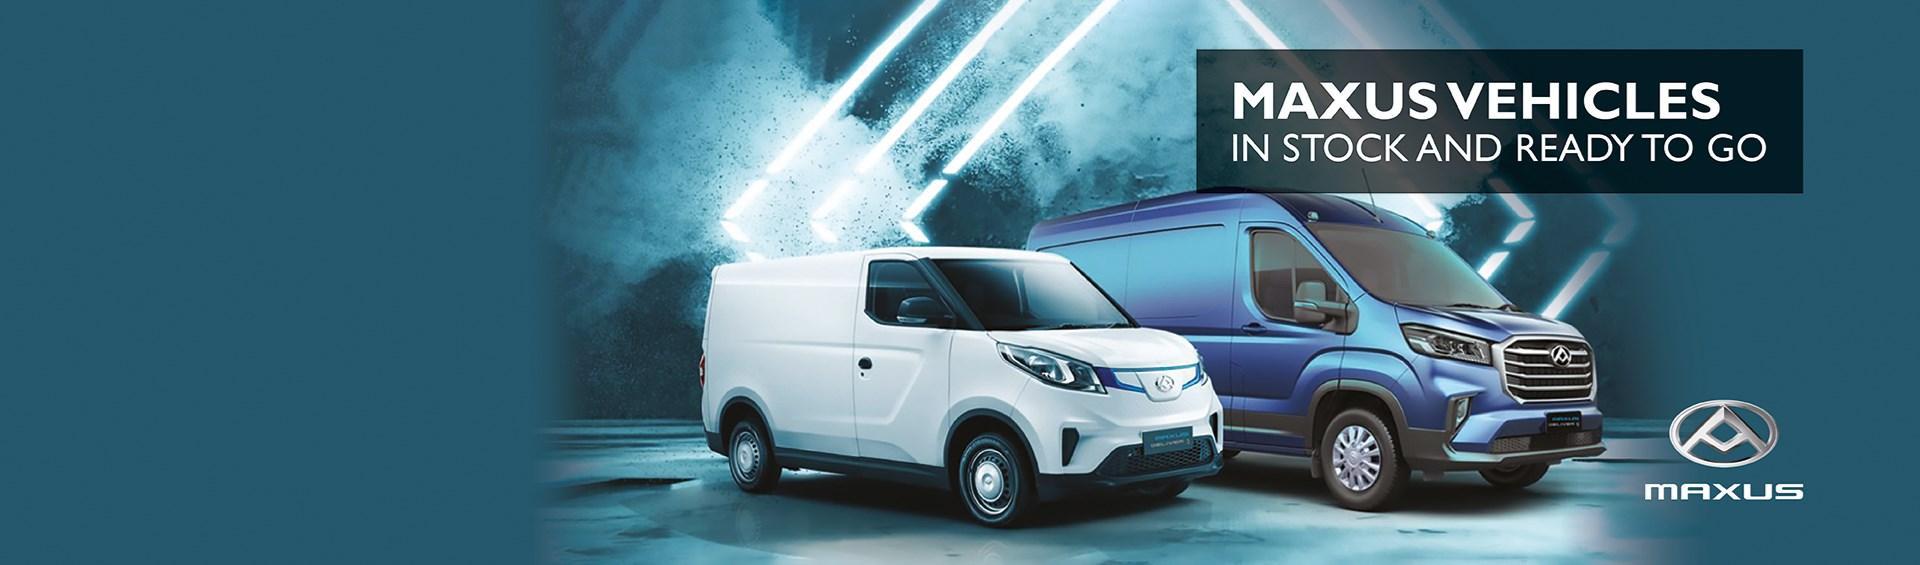 Maxus Vehicles in stock